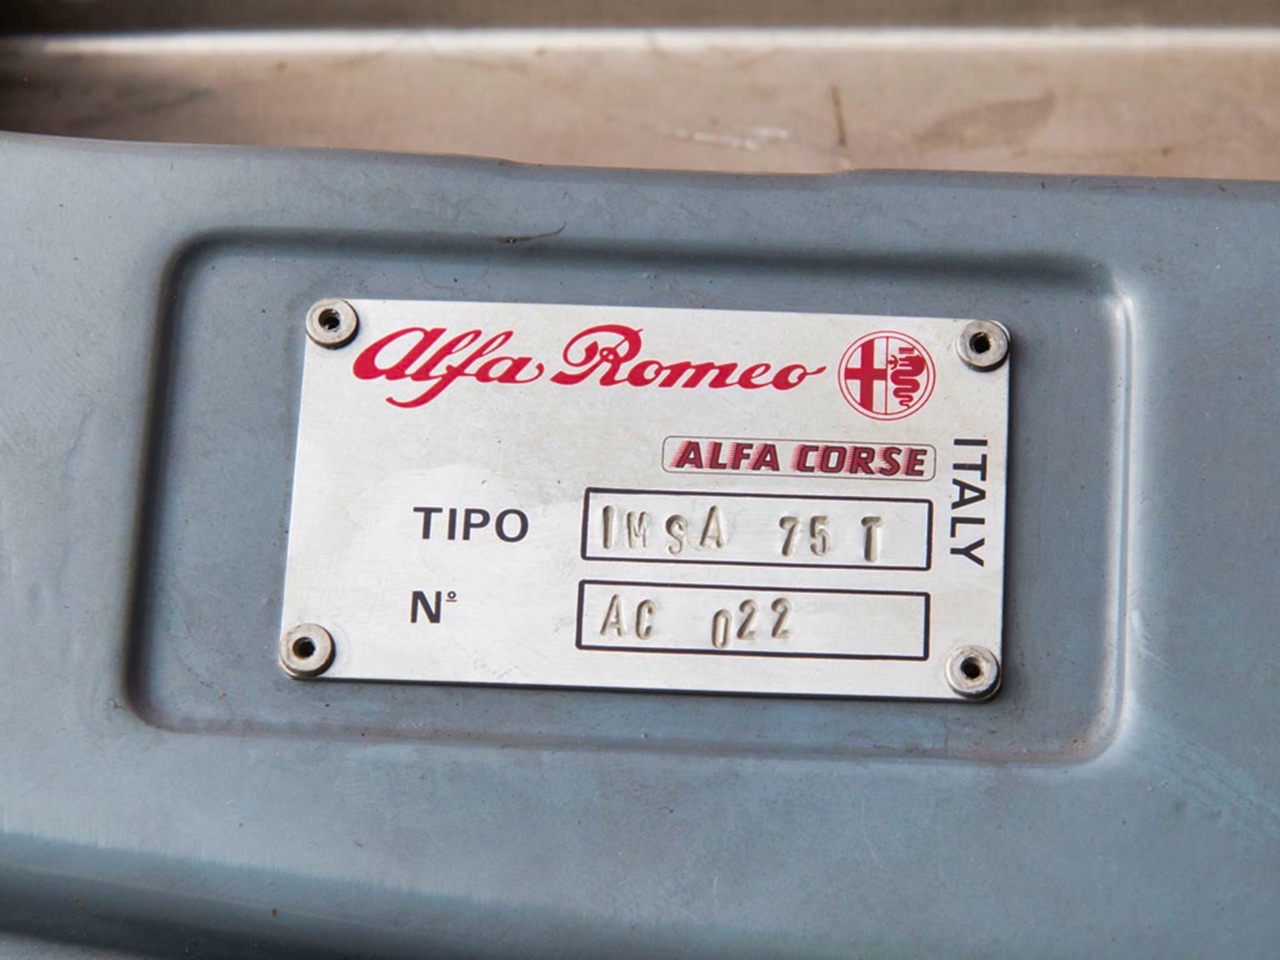 Alfa 75 Turbo IMSA - La plus ultime ! 2